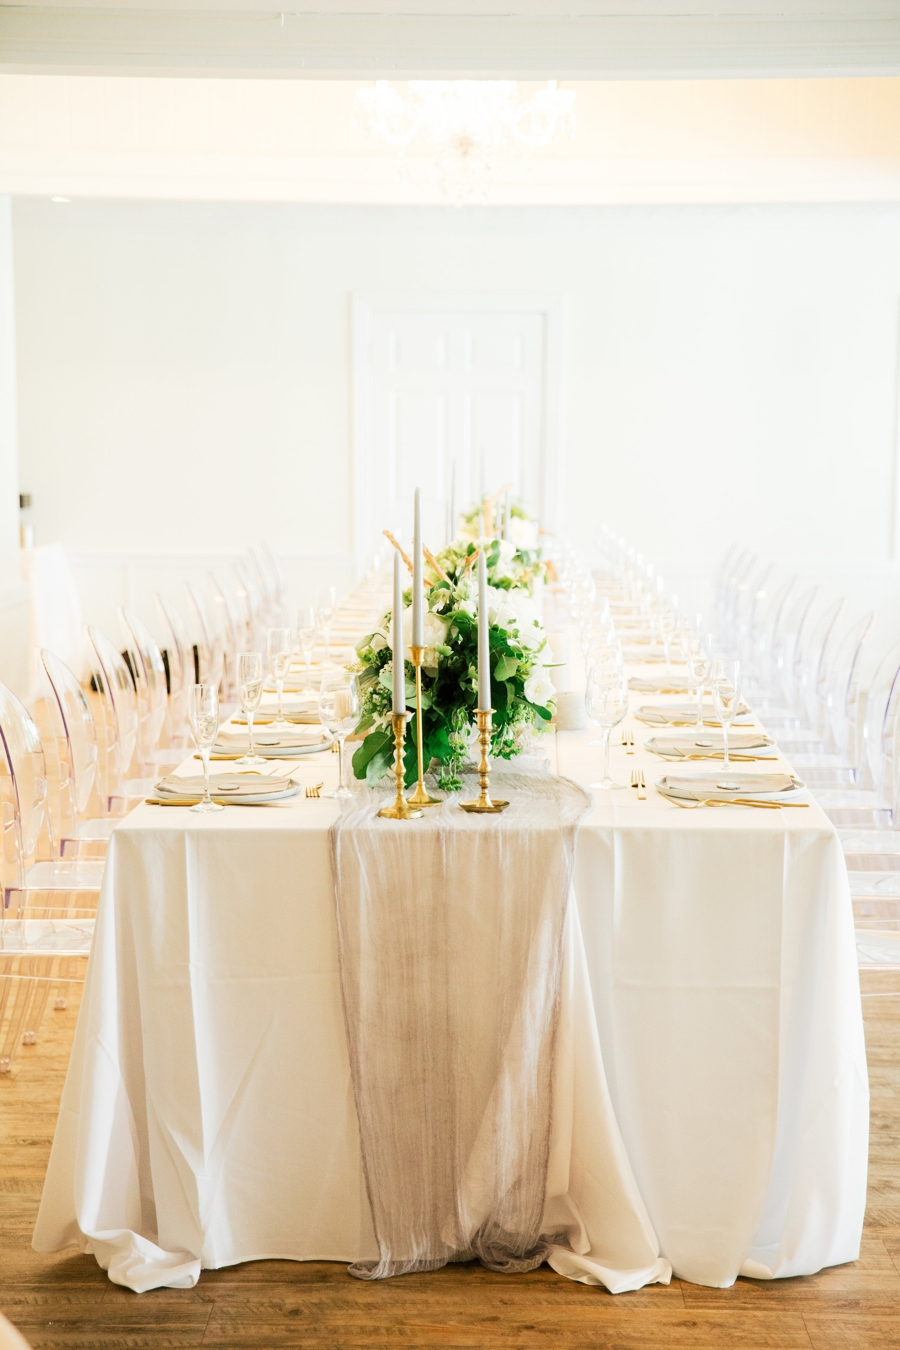 South_Seas_Island_Resort_Destination_Wedding_Planner_Captiva_Sanibel_Weddings_1782.jpg